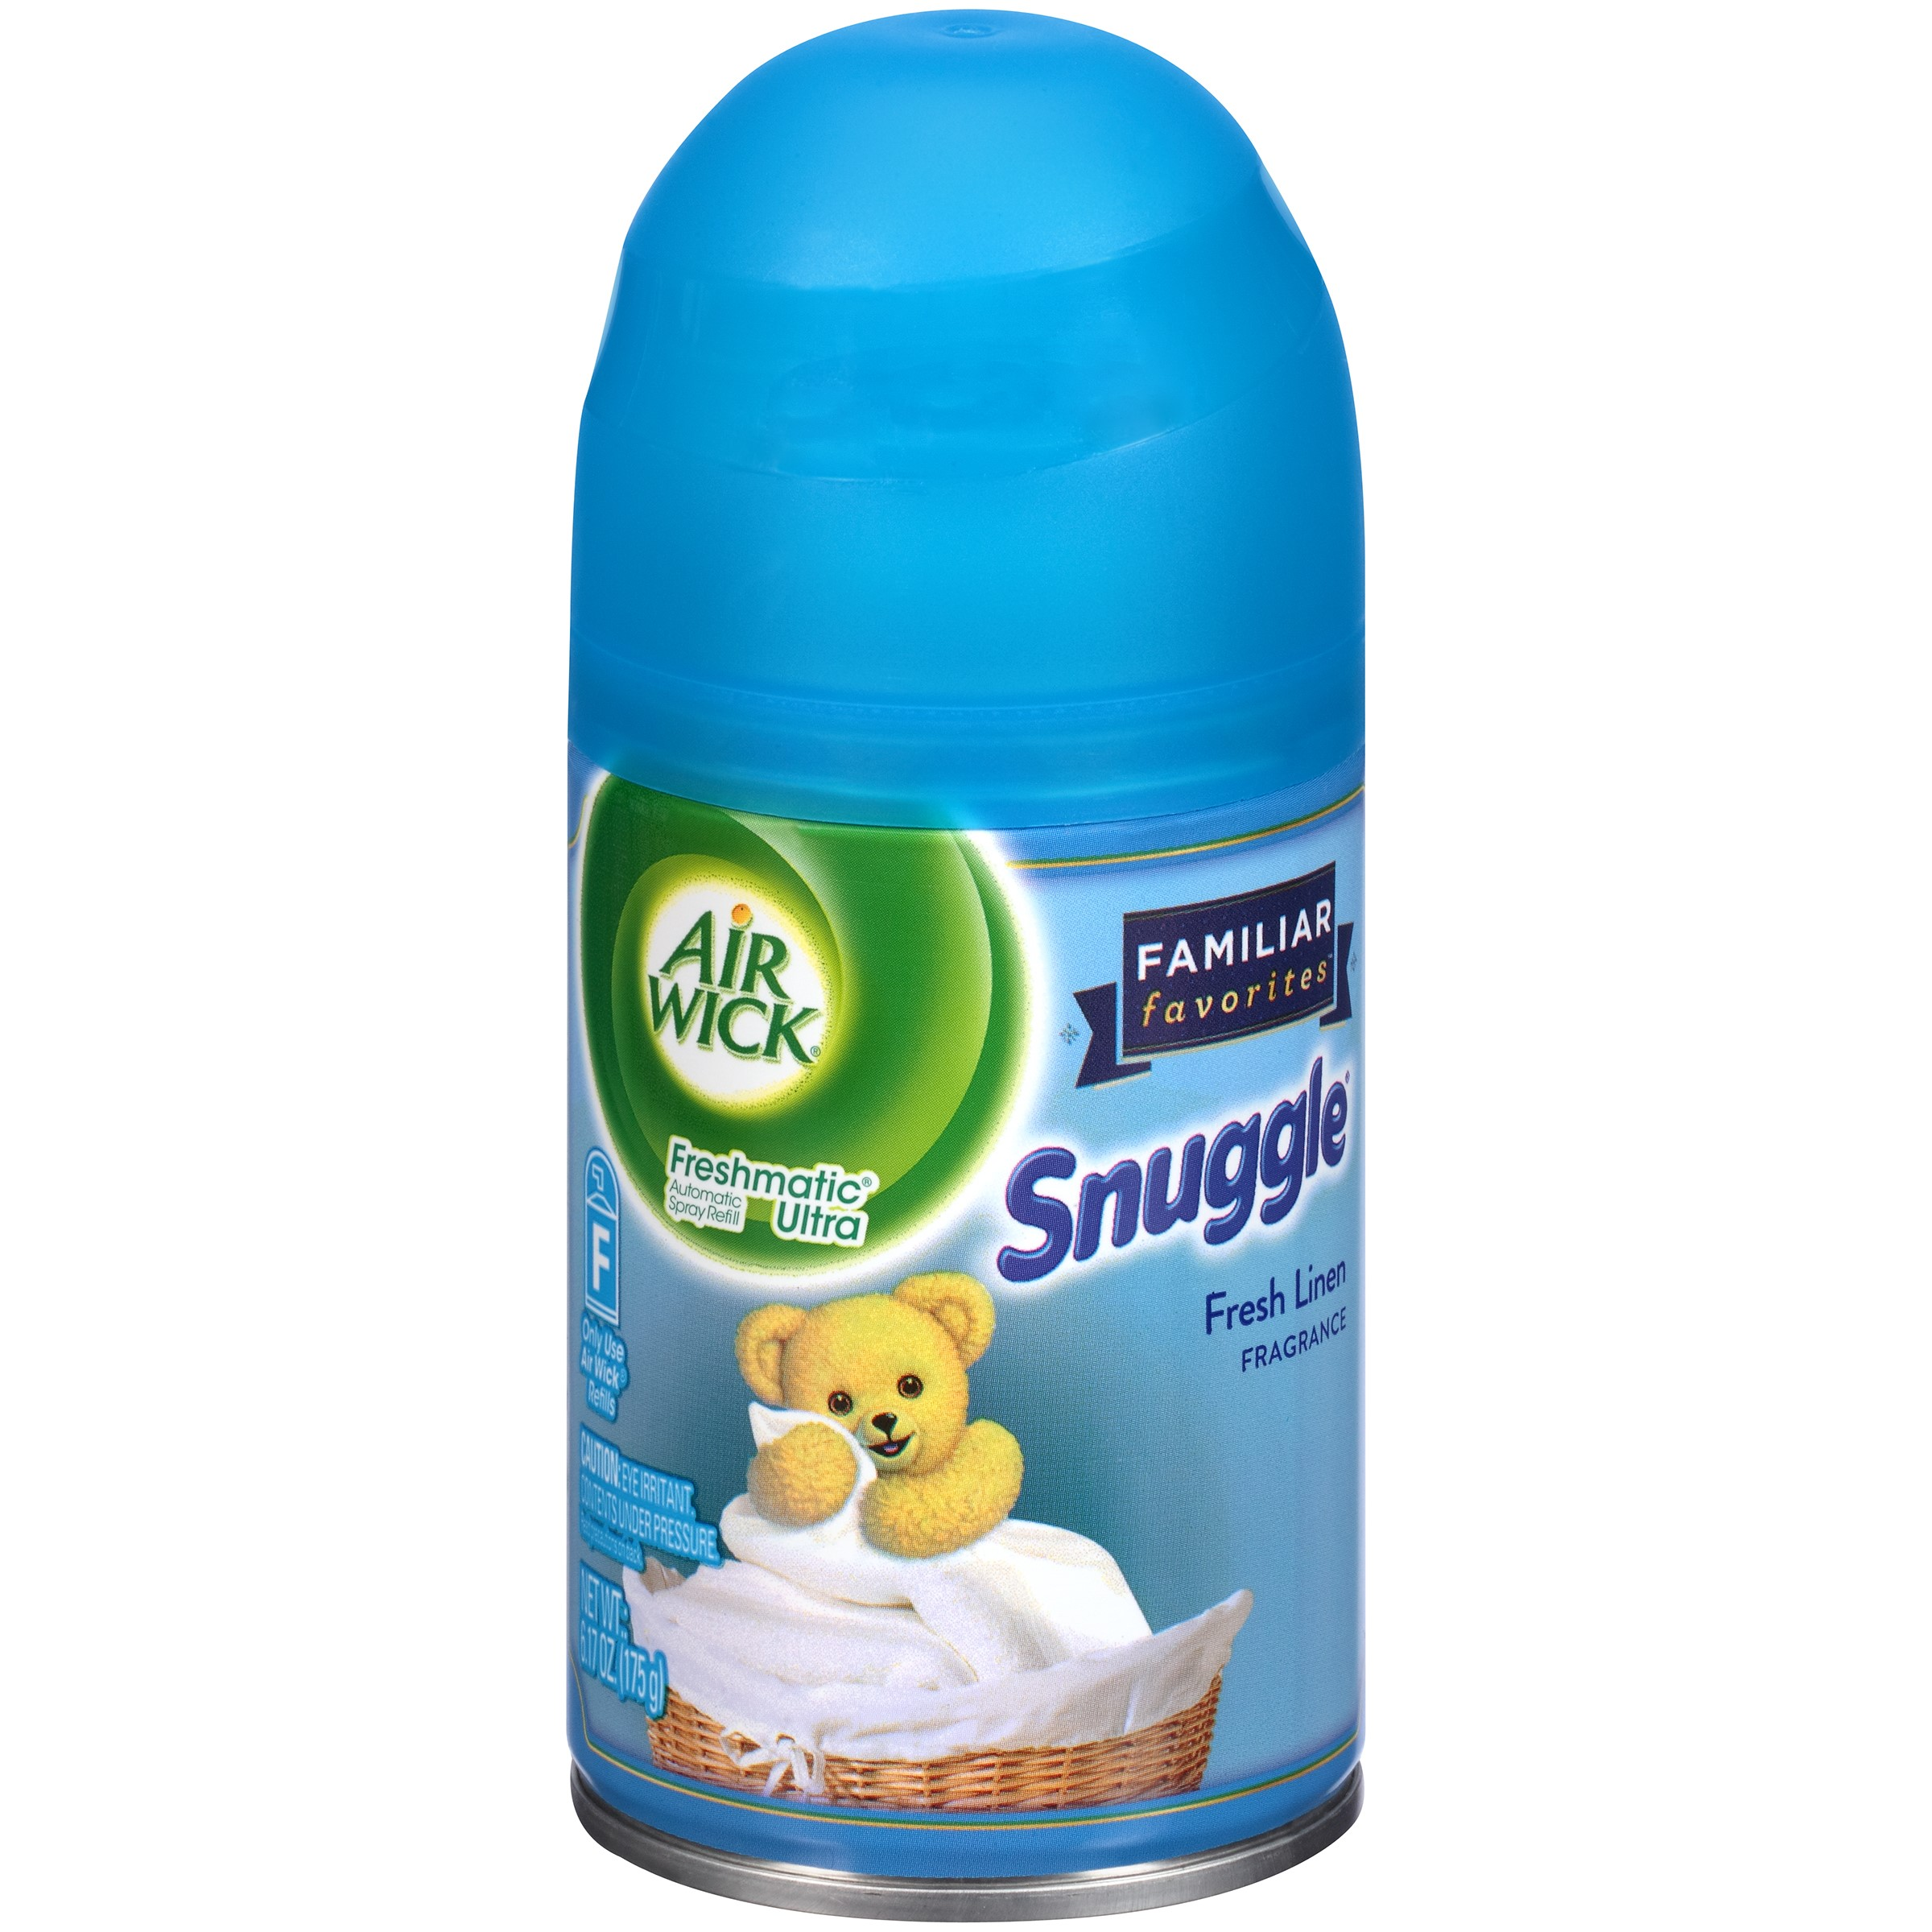 Air Wick Freshmatic Ultra Automatic Spray Refill, Snuggle Fresh Linen, 6.17 Oz